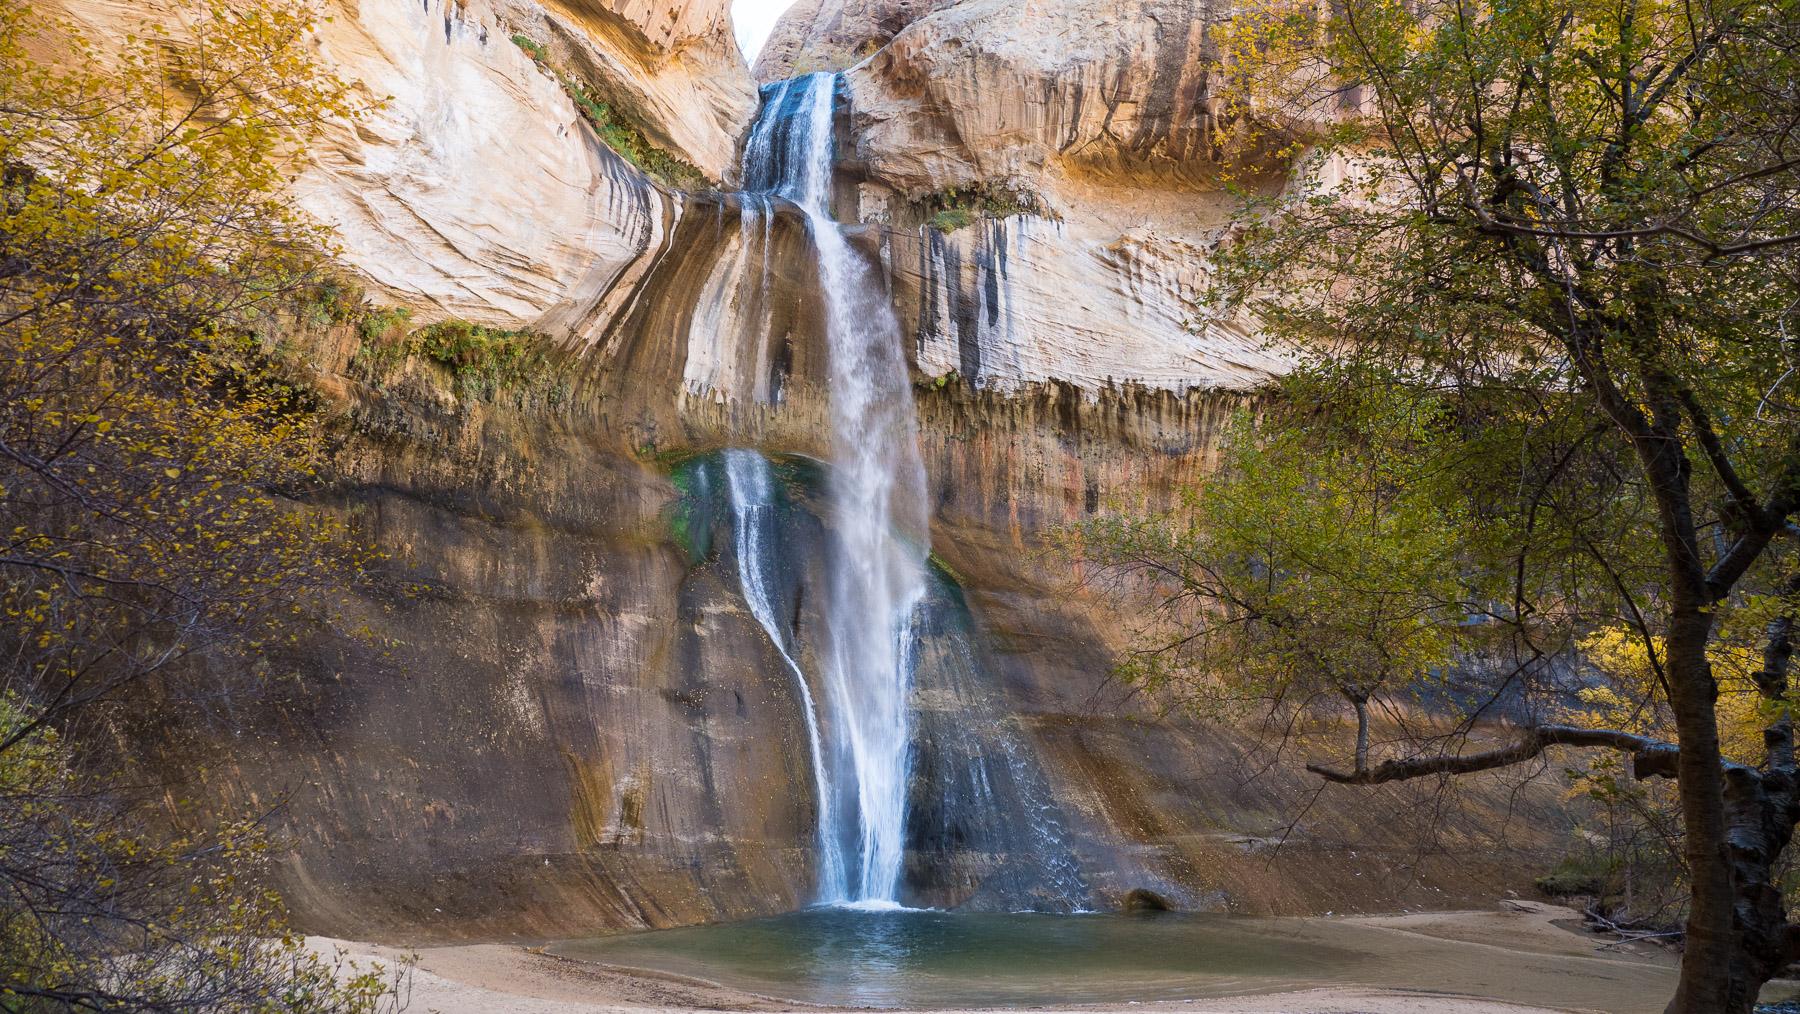 Calf Creek Wasserfall Wanderung:  hat sich gelohnt